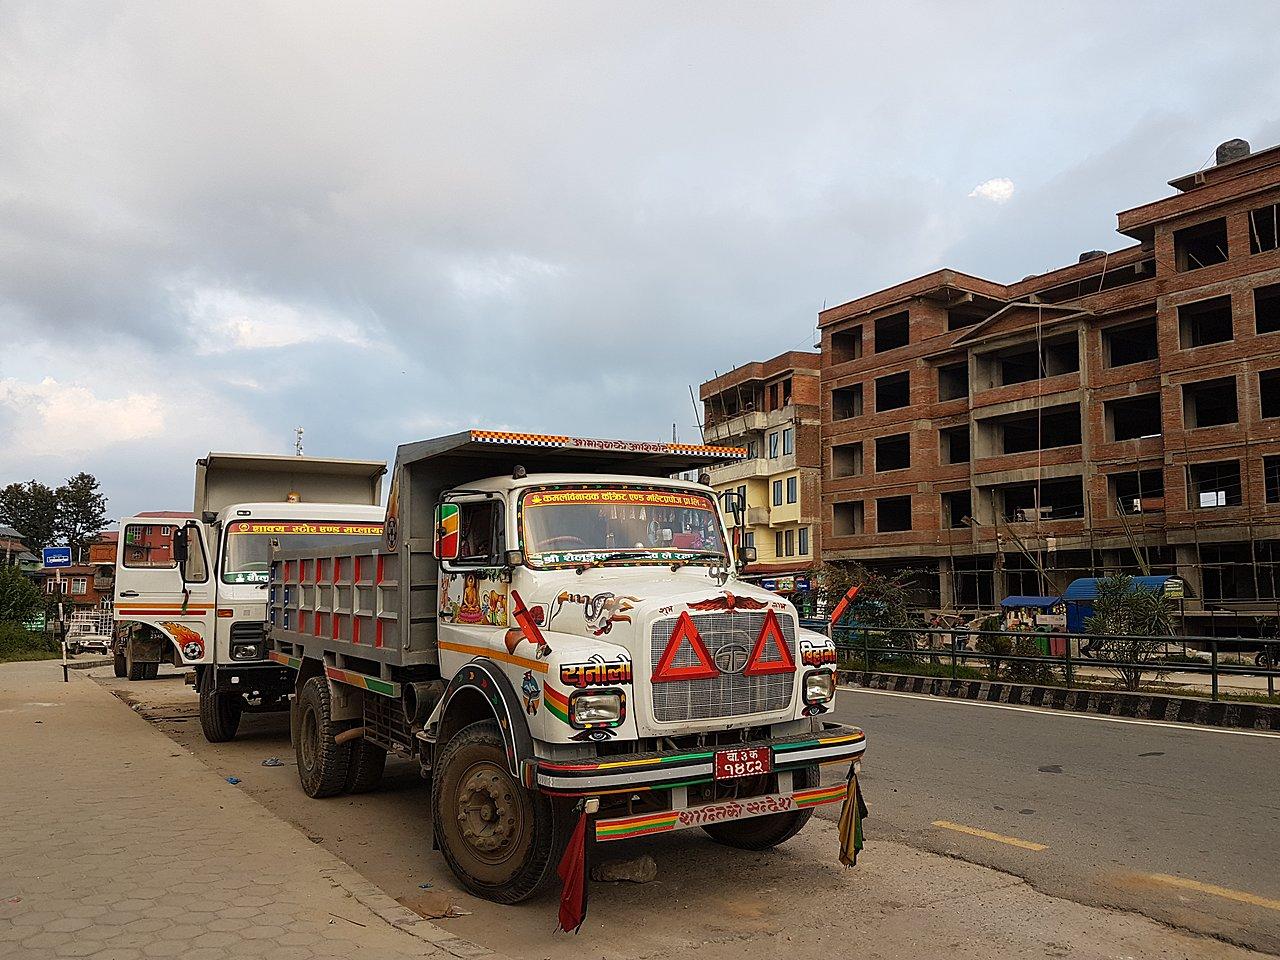 Loved the trucks | Photo taken by Sue C